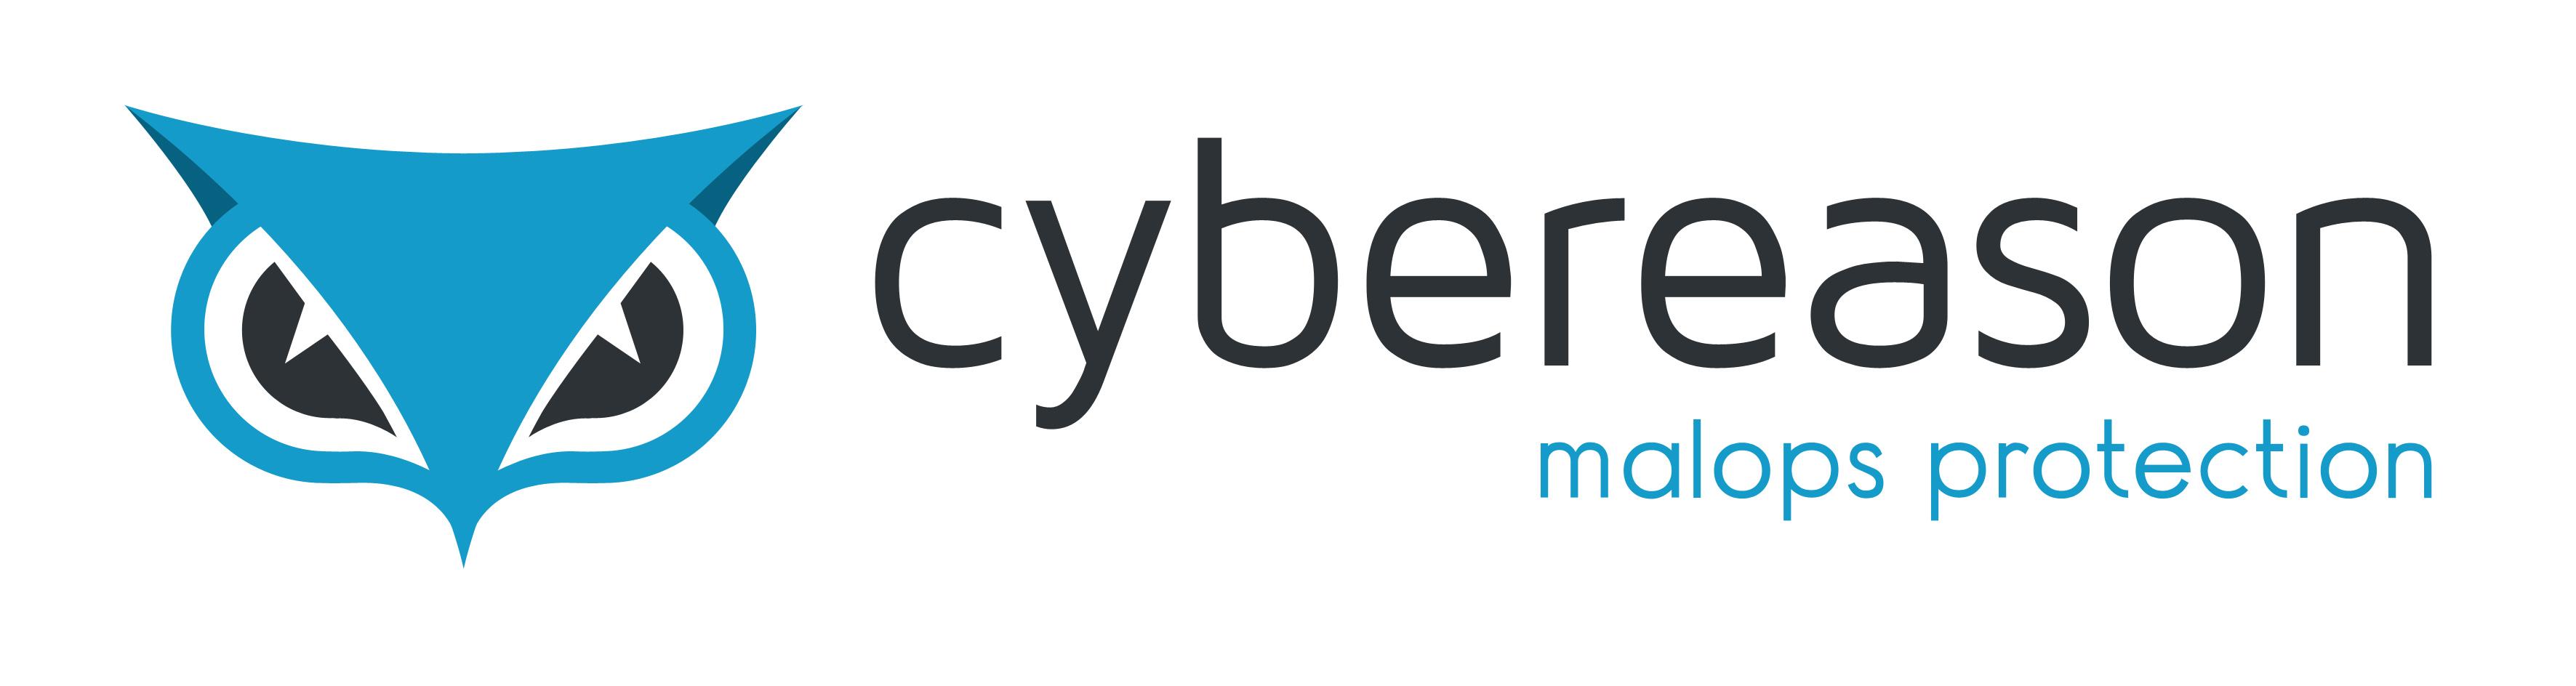 Cybereason Jobs and Careers | דרושים ומשרות | Startup Jobs in Israel